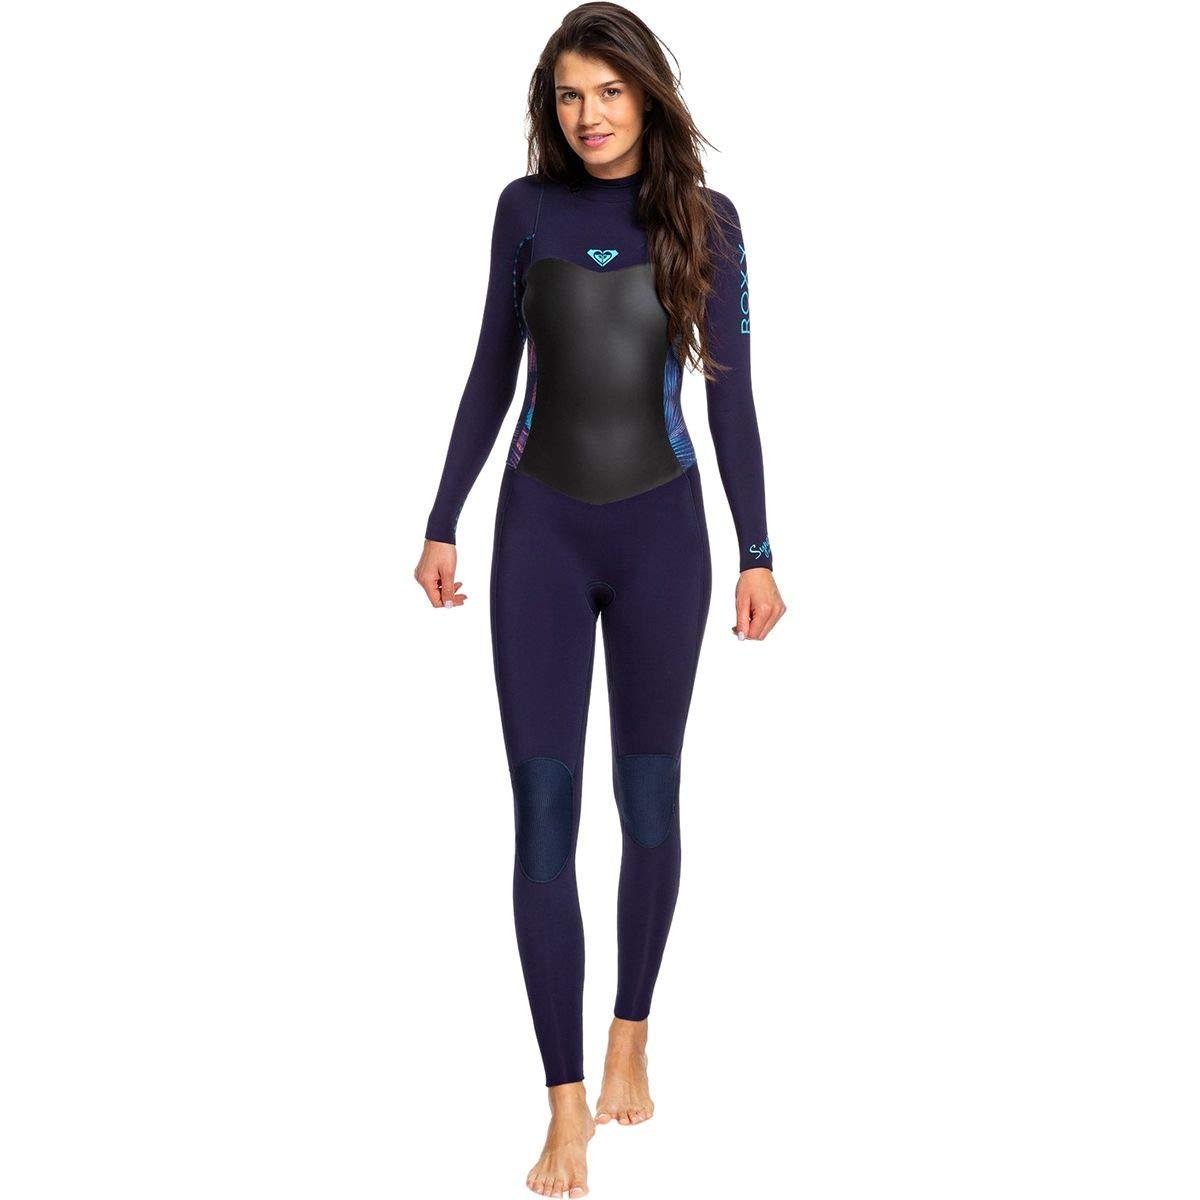 Roxy 3/2 Syncro Back-Zip GBS Wetsuit - Women's Blue Ribbon/Coral Flame, 14 by Roxy